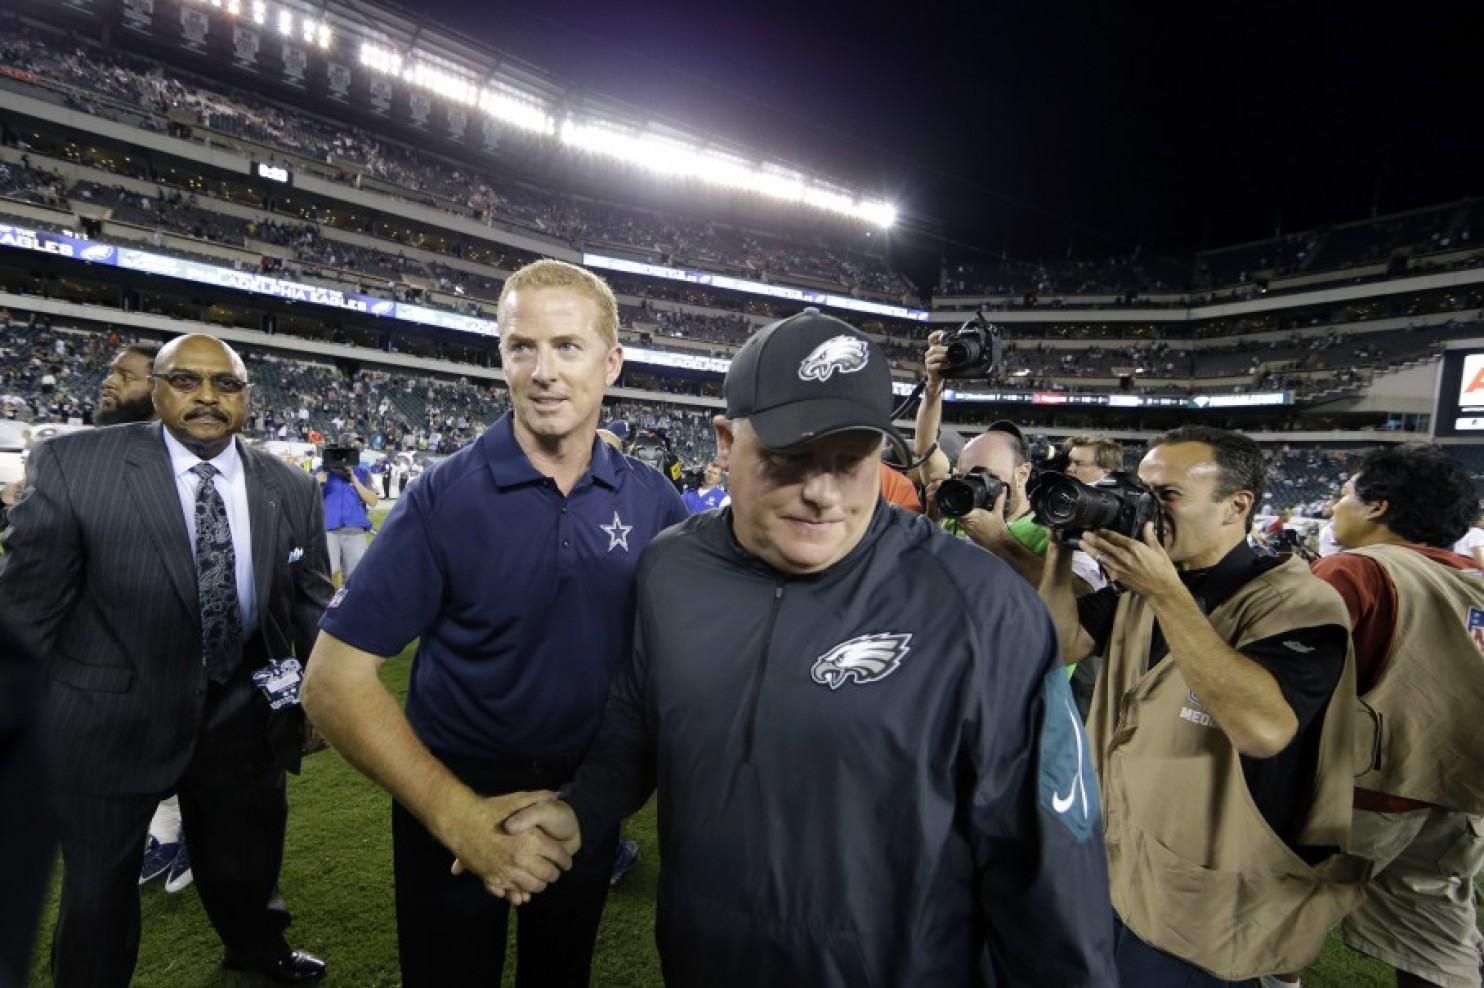 Cowboys Blog - Dallas Cowboys Run NFC East Through Week 2 Of NFL Season